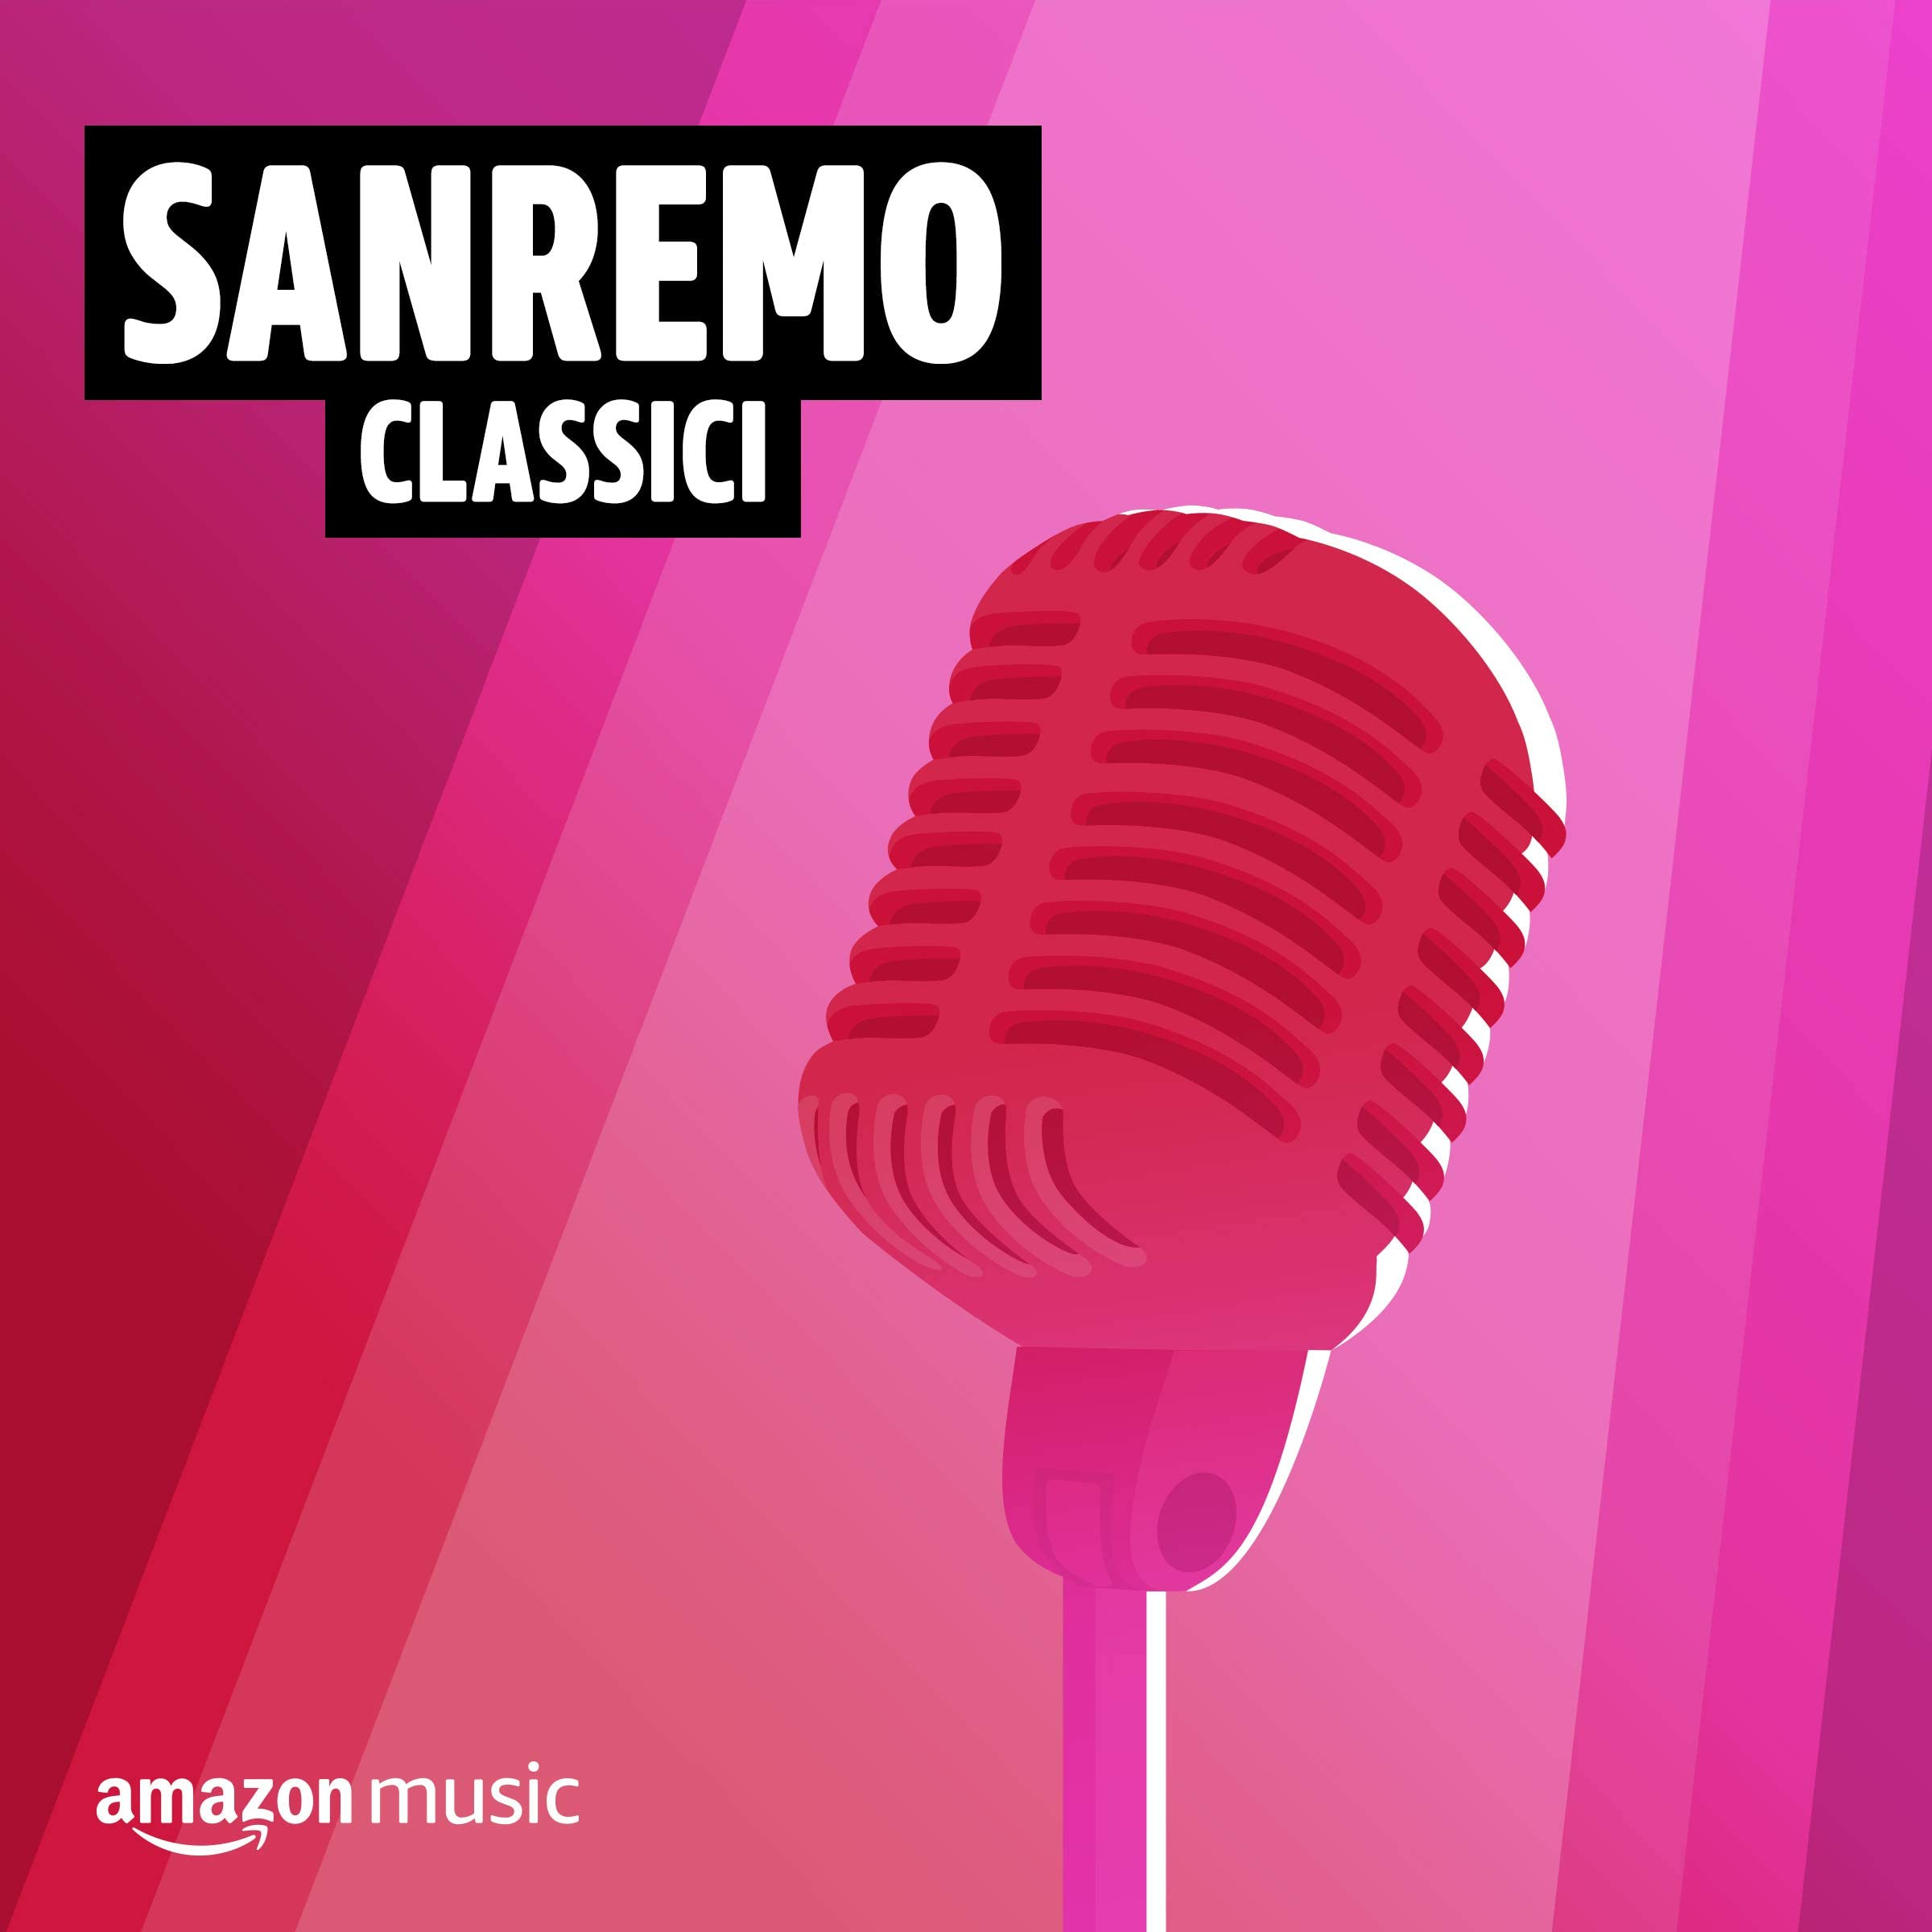 Sanremo Classici